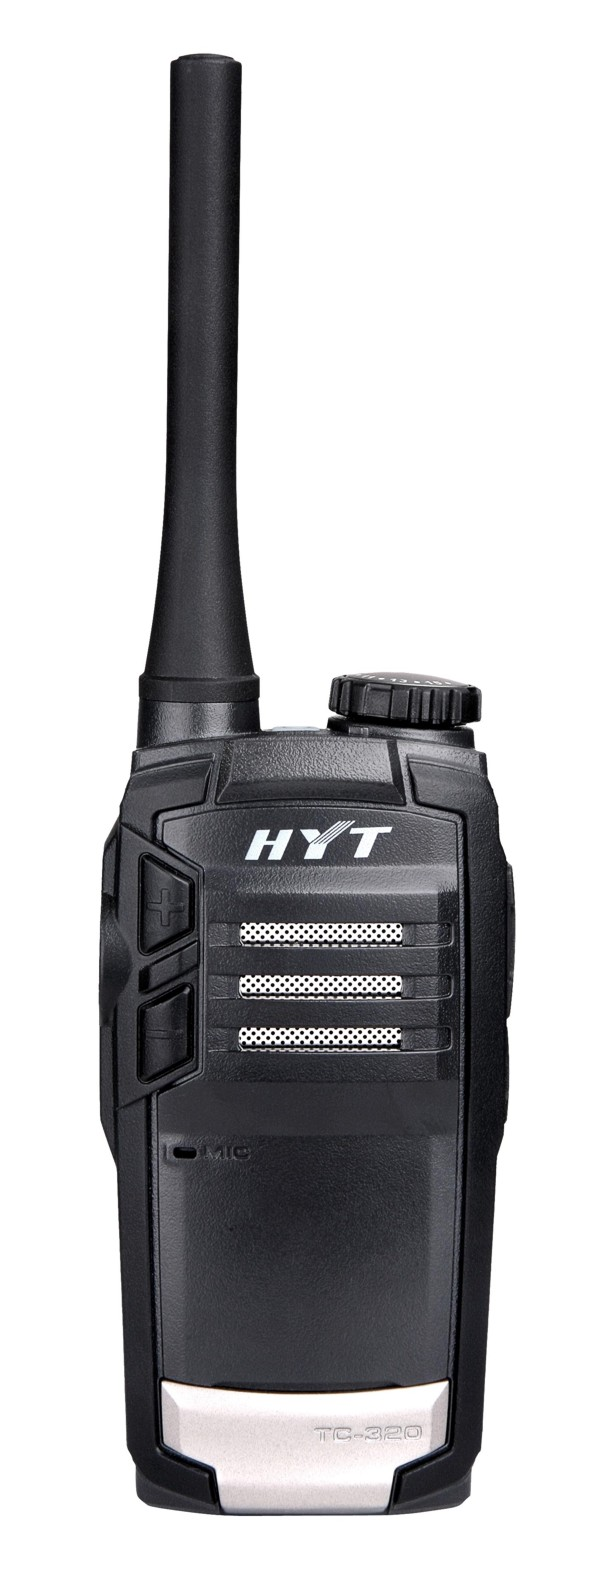 HYT TC 320 - dwupak